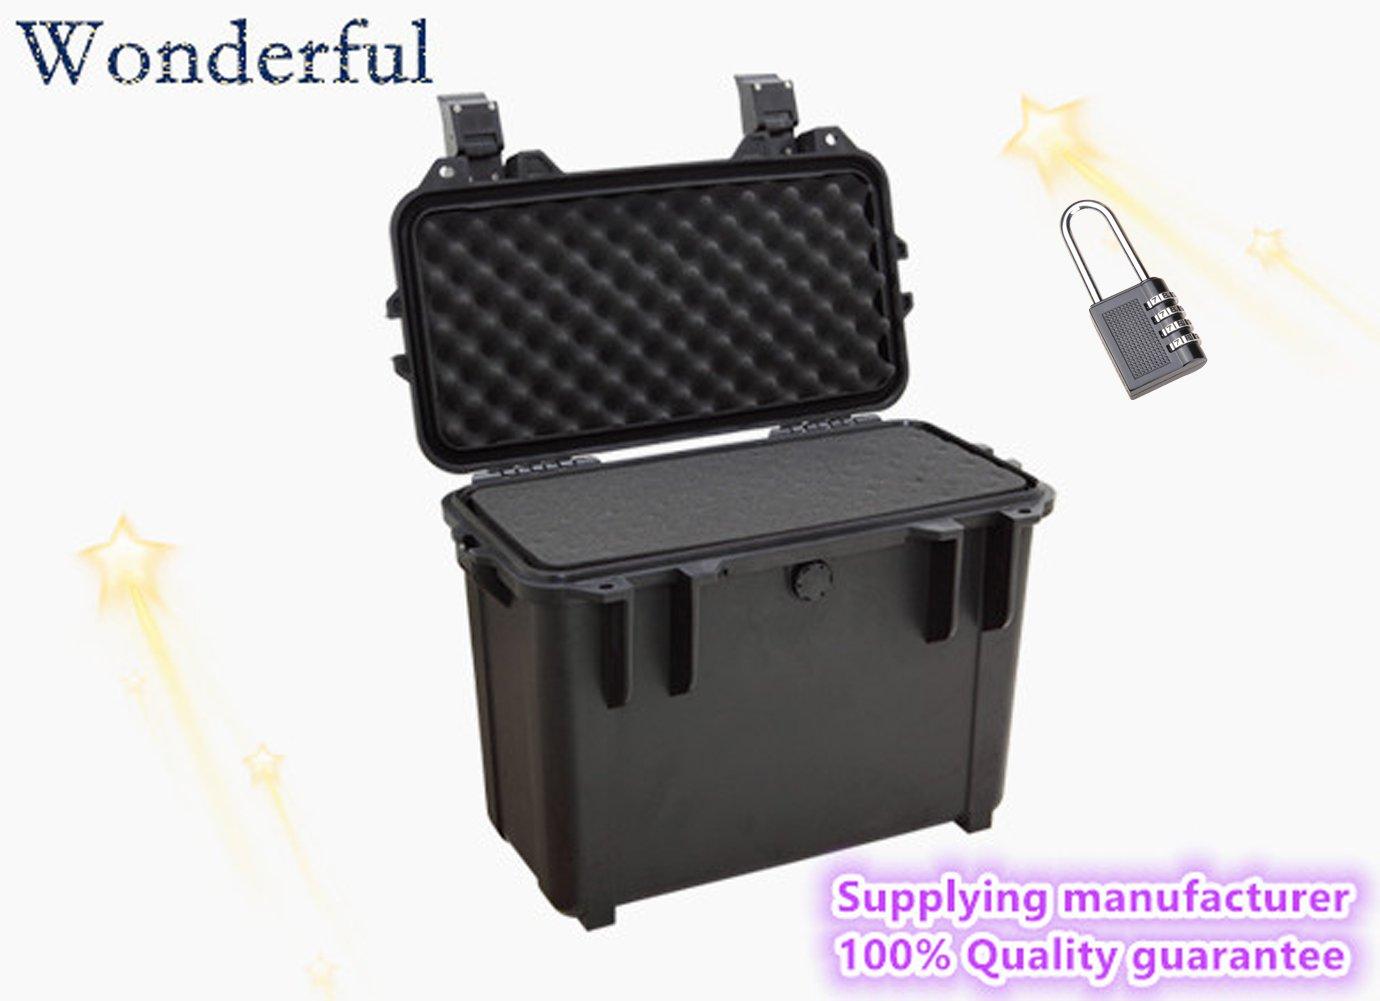 Wonderful pc-3930s Watertight Cases使用ABS素材、高強度と影響抵抗、絶対密封防水、防塵for yourカメラと機器エスコート(ブラック/オレンジ)   B01ELKYXBG